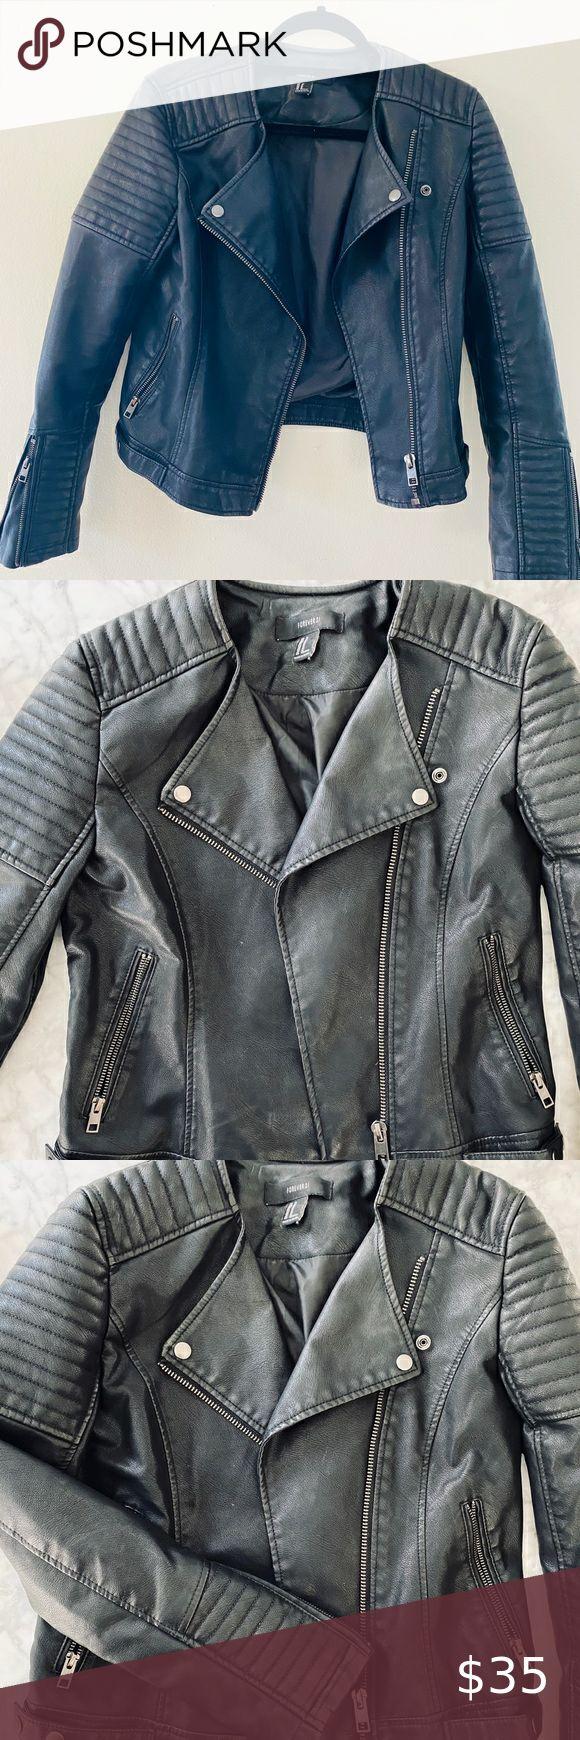 "Forever 21 Black ""Leather"" Jacket Black pleather"